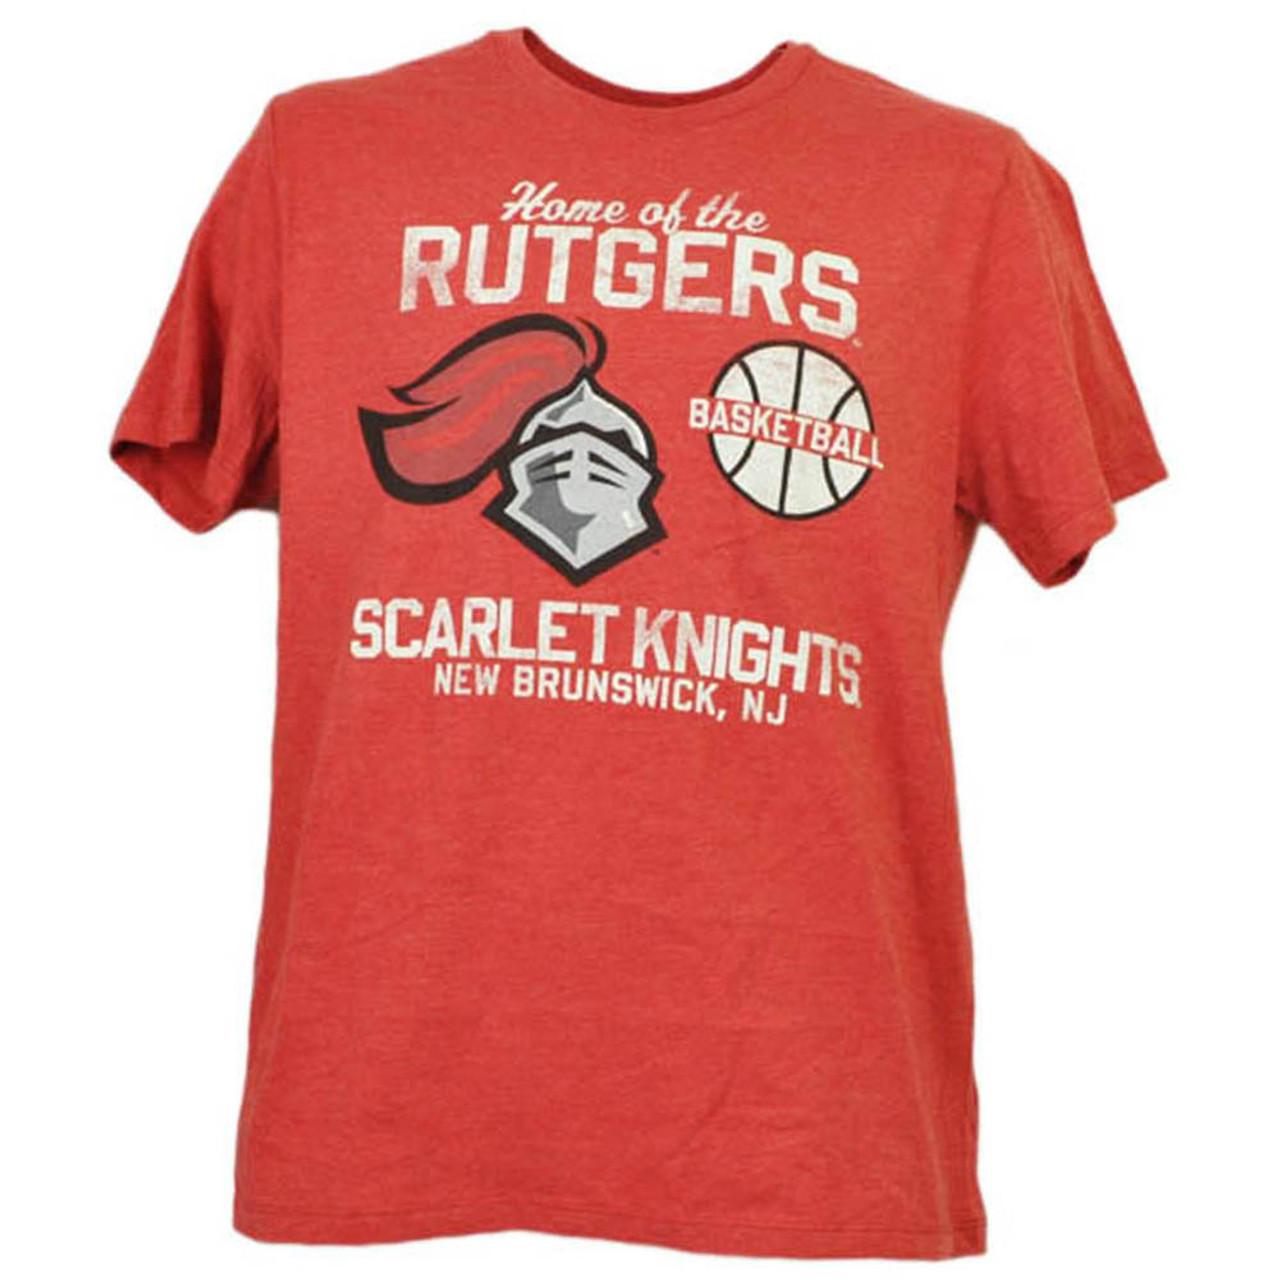 new style fd702 bb86b NCAA Rutgers Scarlet Knights Basketball New Brunswick NJ Red Tshirt Tee  Mens - Cap Store Online.com